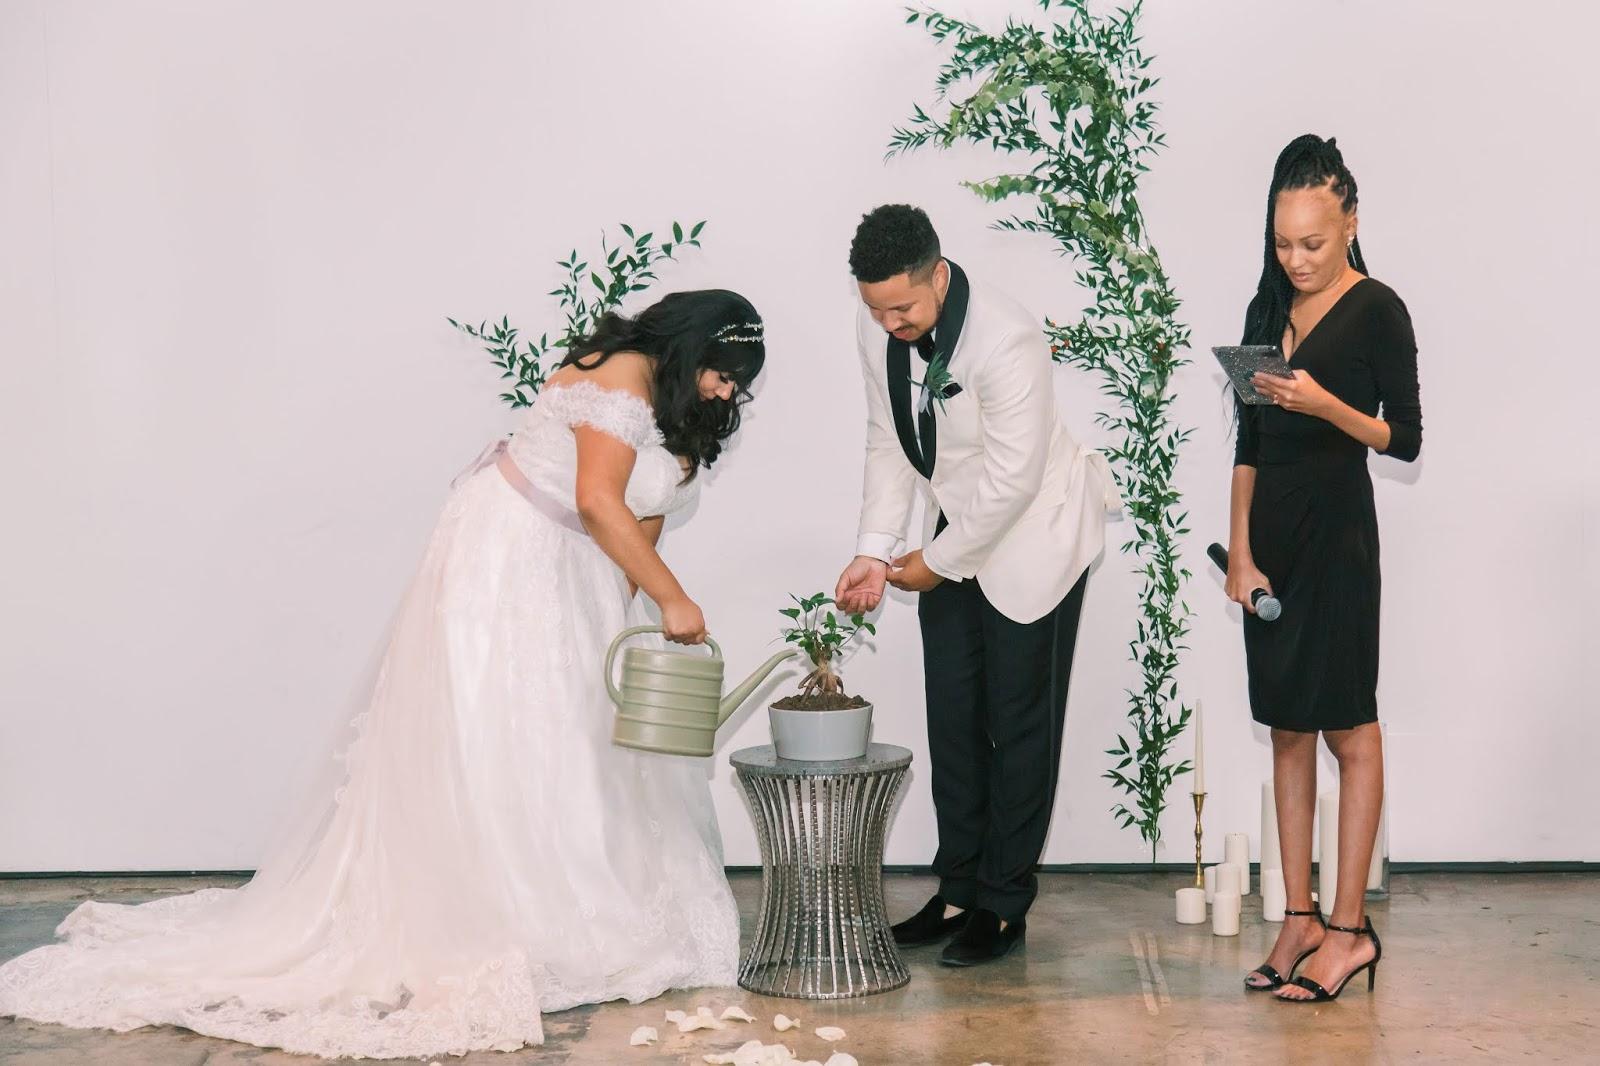 african american wedding officiant, las vegas wedding, tree planting